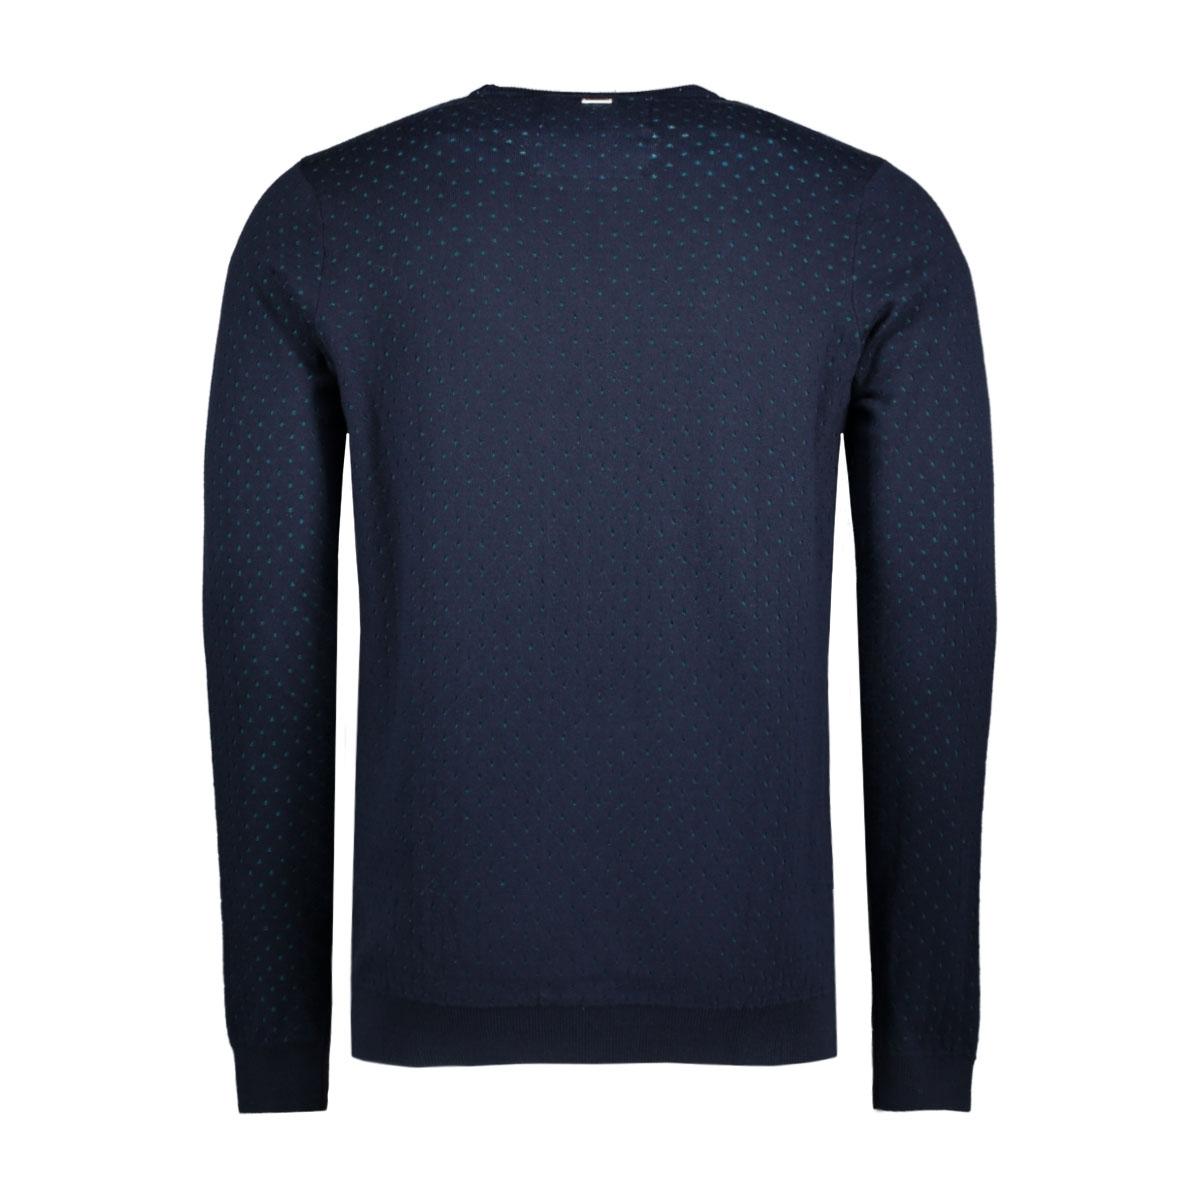 vkw177180 vanguard sweater 5073